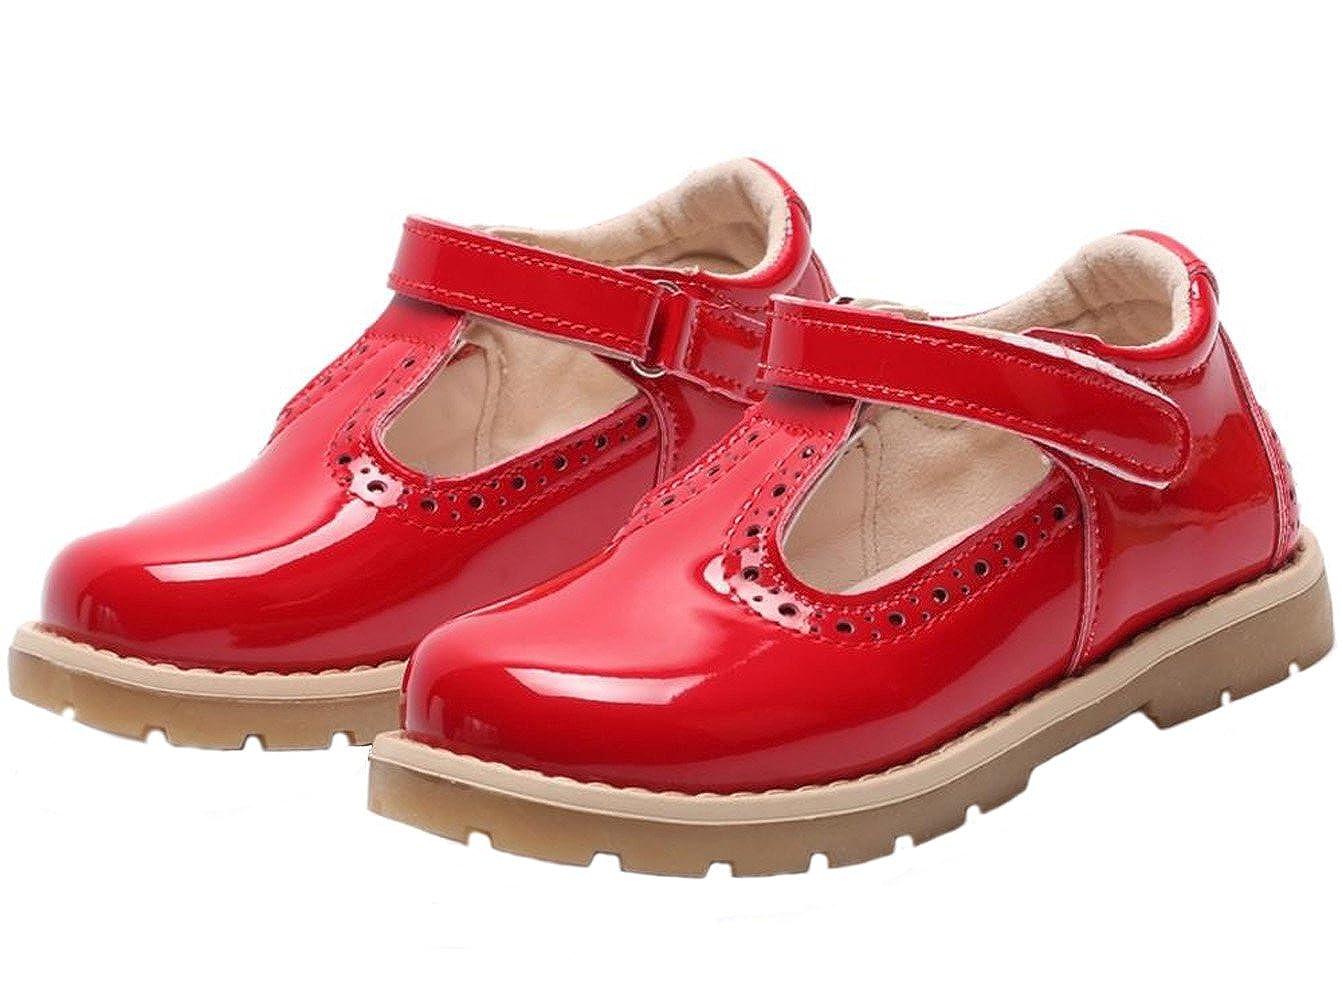 WUIWUIYU Girls' Fashion British Retro T-Strap Princess Oxfords Shoes Mary Jane Flats Toddler Little Kid 250358U